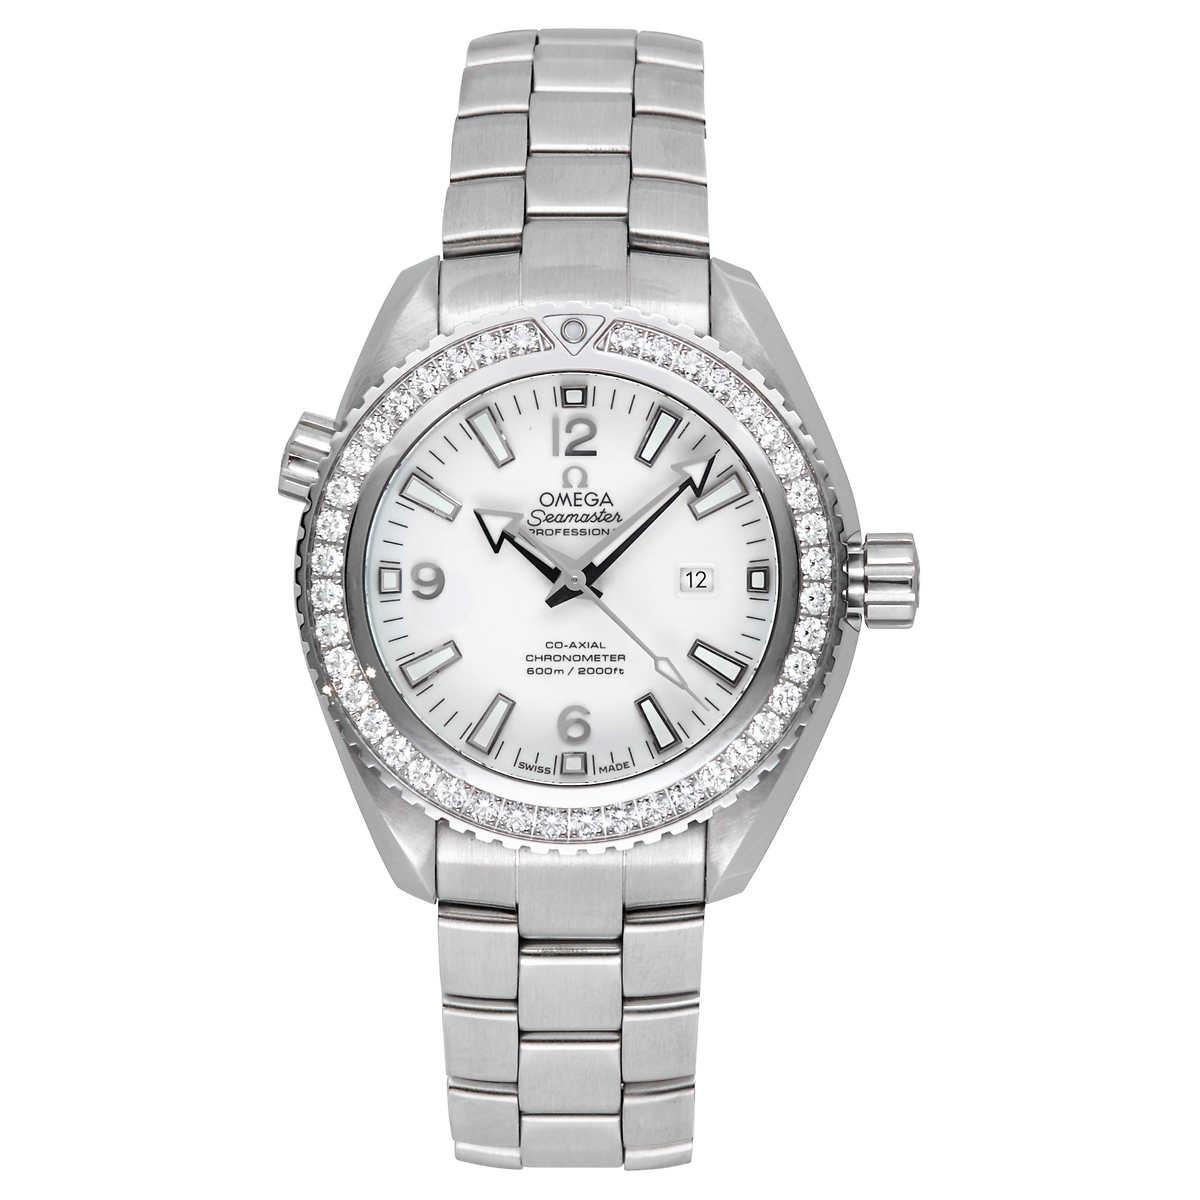 042bea371 ... Omega Seamaster Planet Ocean Women's Watch. 1 1